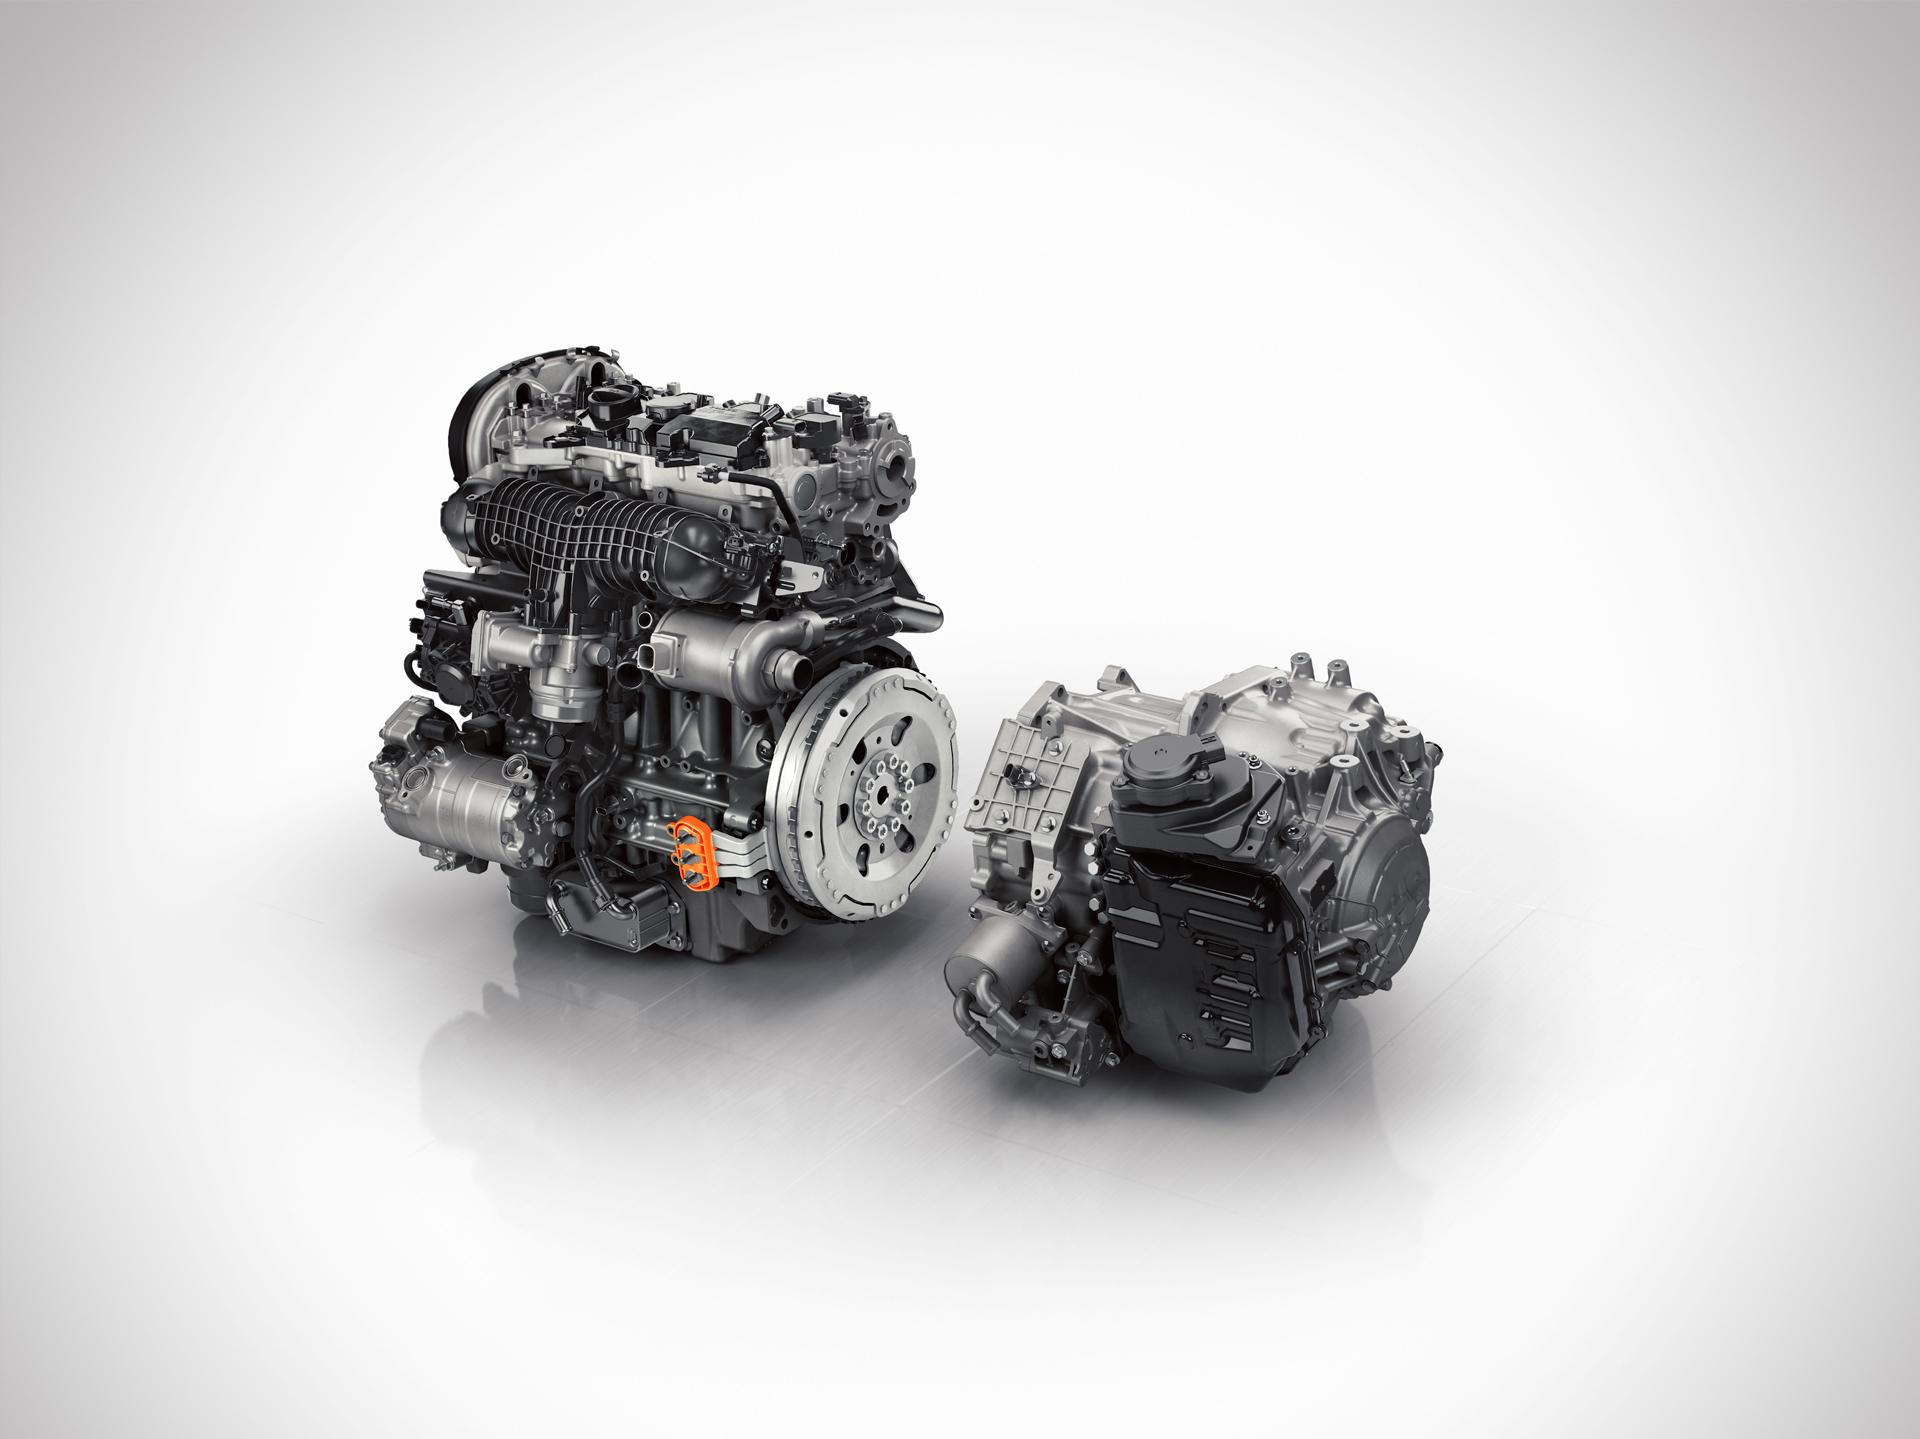 Volvo XC90 - Powertrain ISG